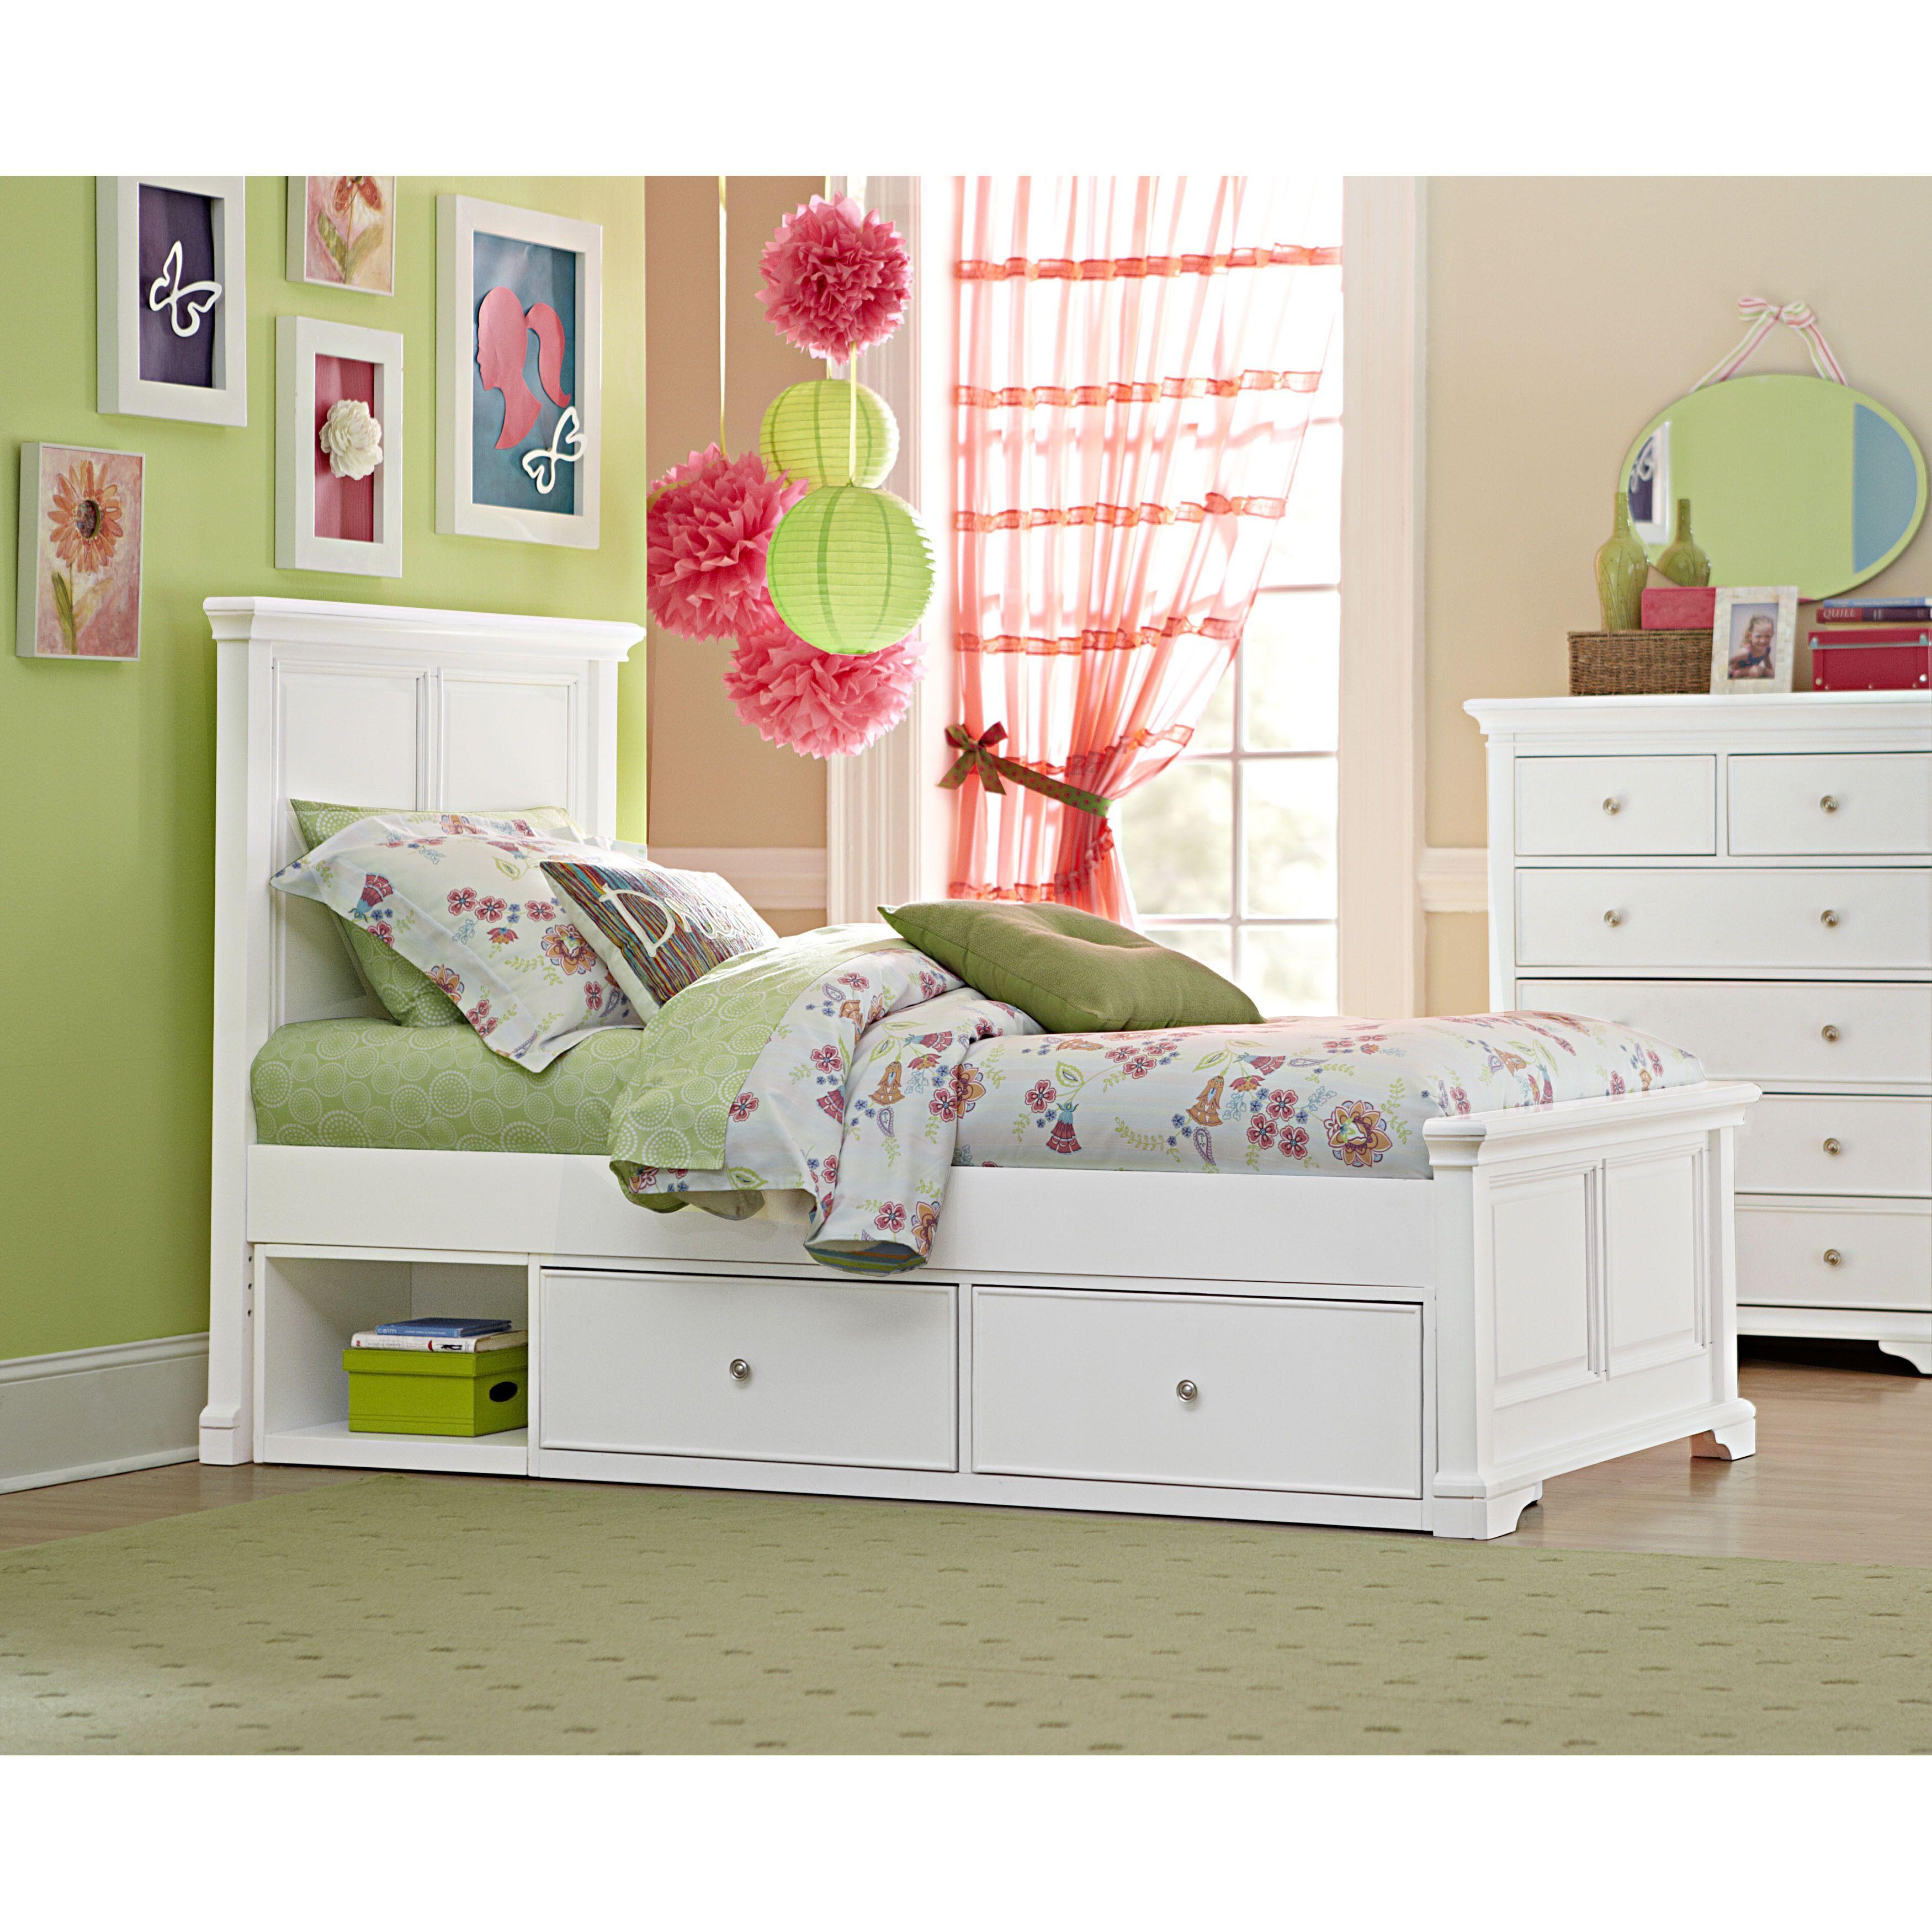 NE Kids Walnut Street Devon White Twinsize Panel Bed and